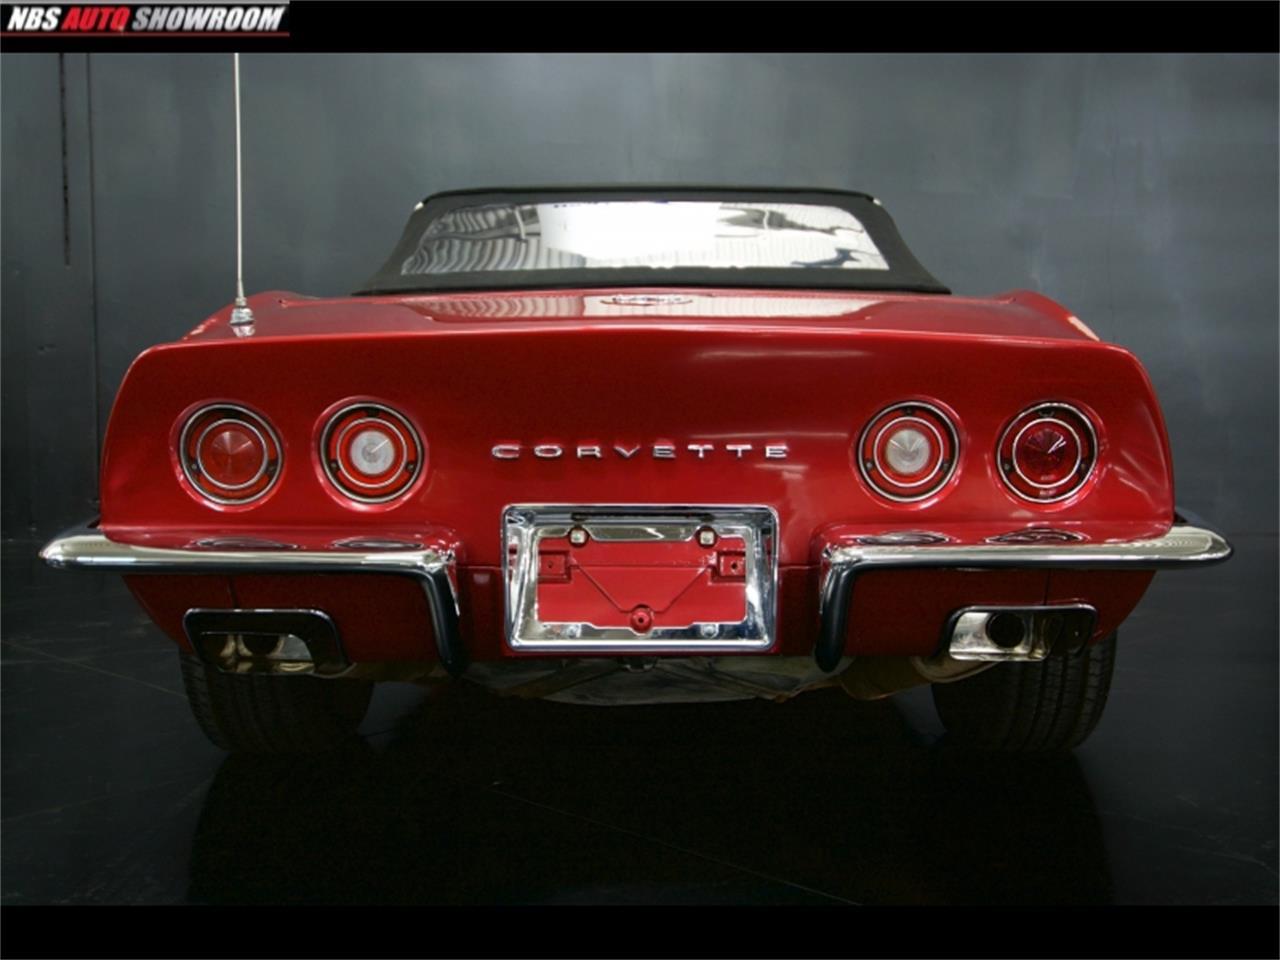 1971 Chevrolet Corvette (CC-1271574) for sale in Milpitas, California